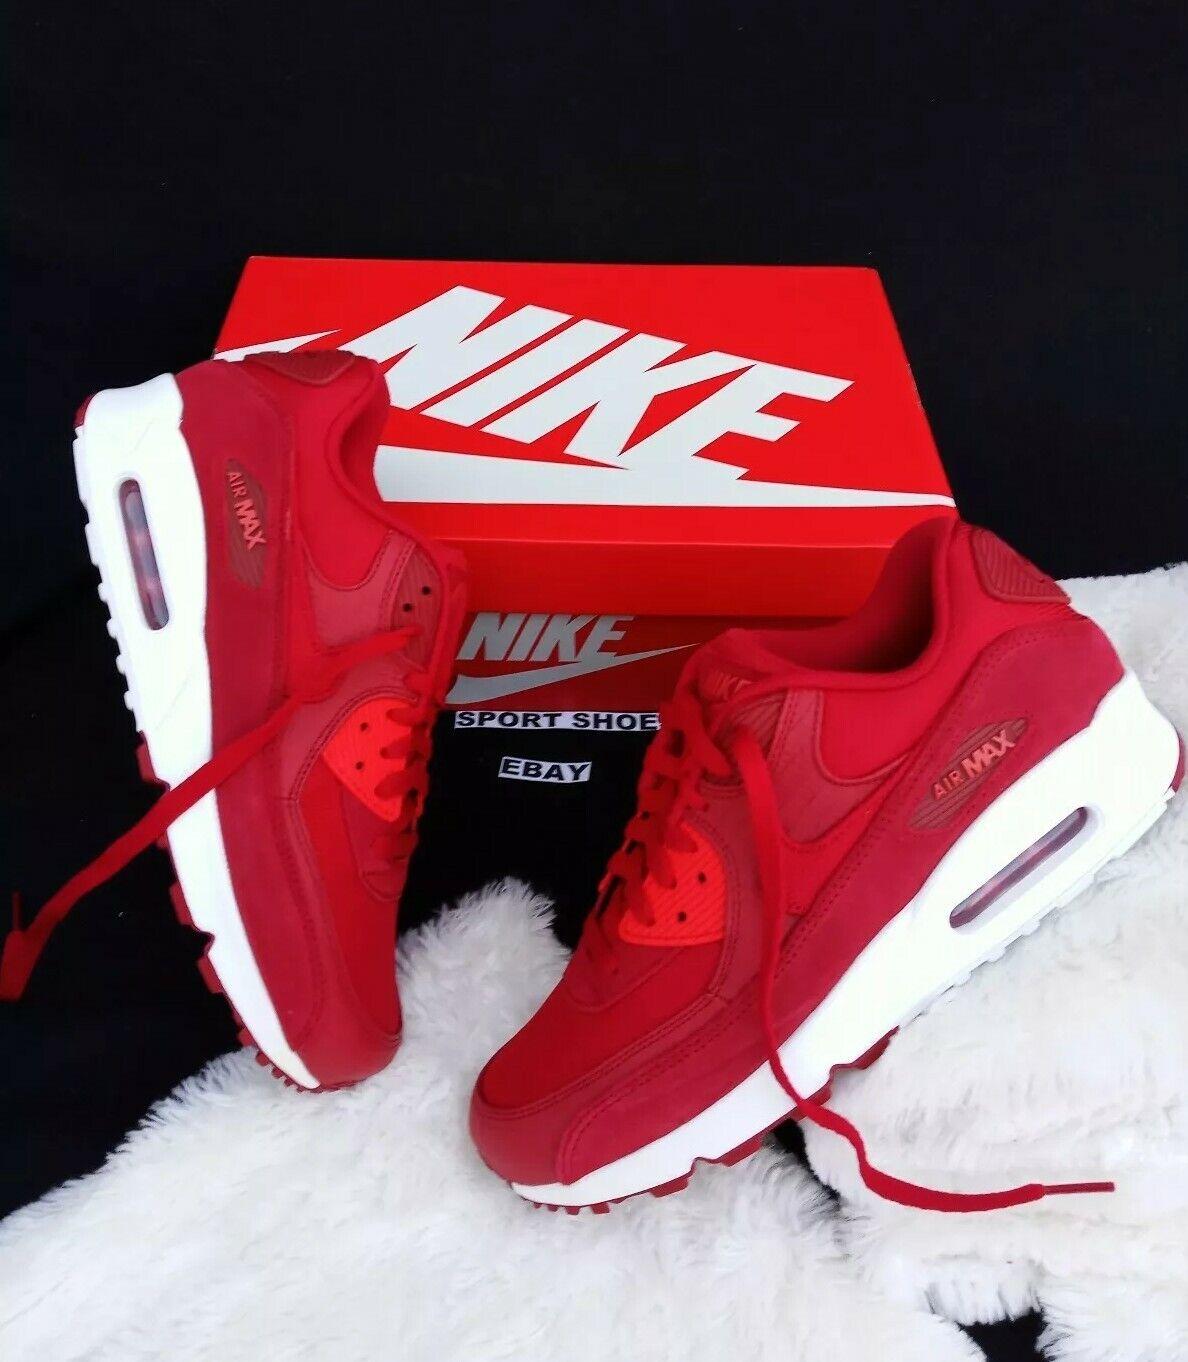 the best attitude b1fc2 7baa4 9 Men s Nike Air Max 90 Premium white 700155-602 700155-602 700155-